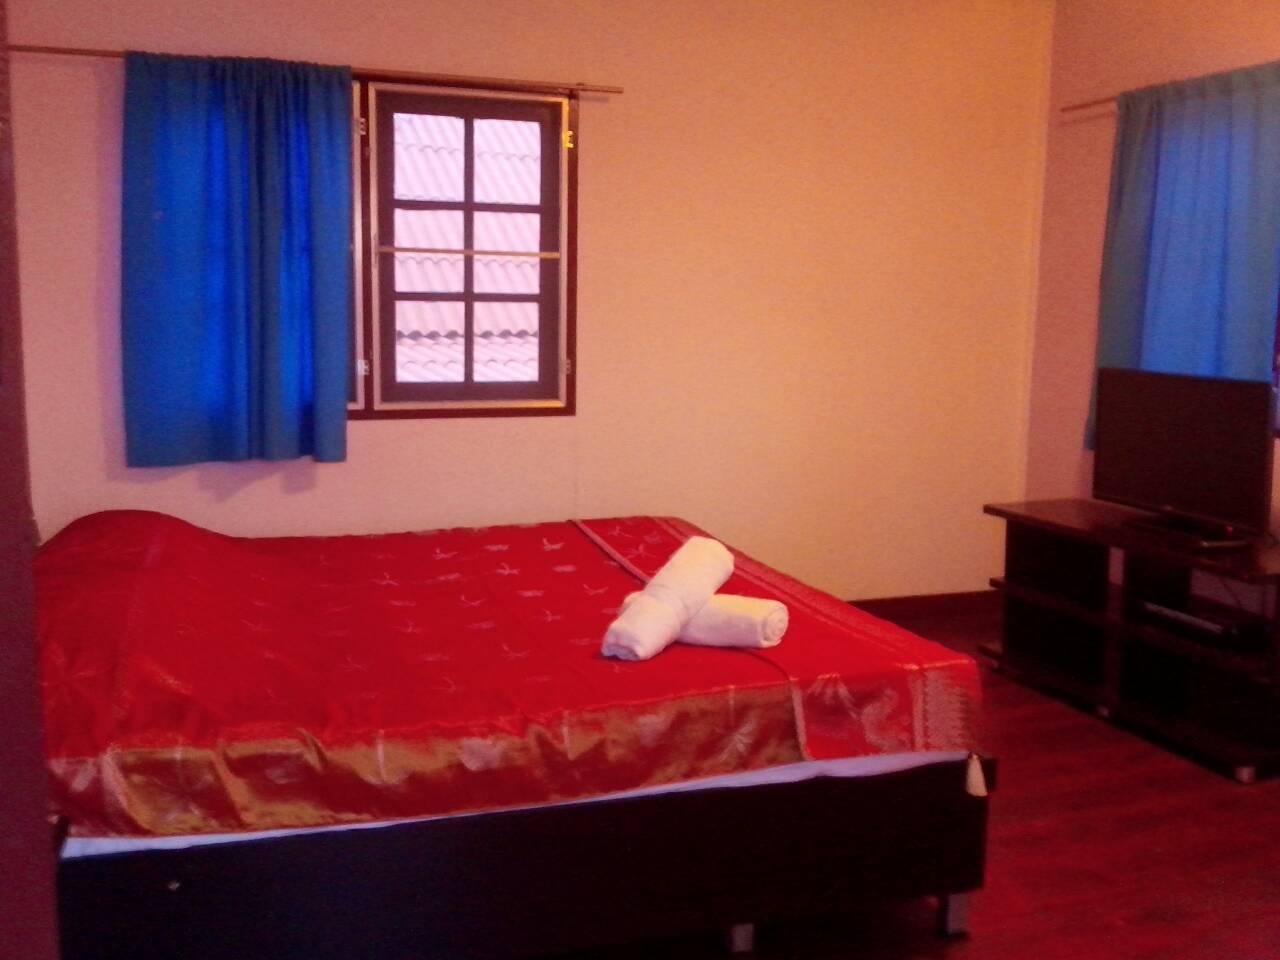 Karoon Hut Guesthouse,กรุณฮัท เกสท์เฮาส์